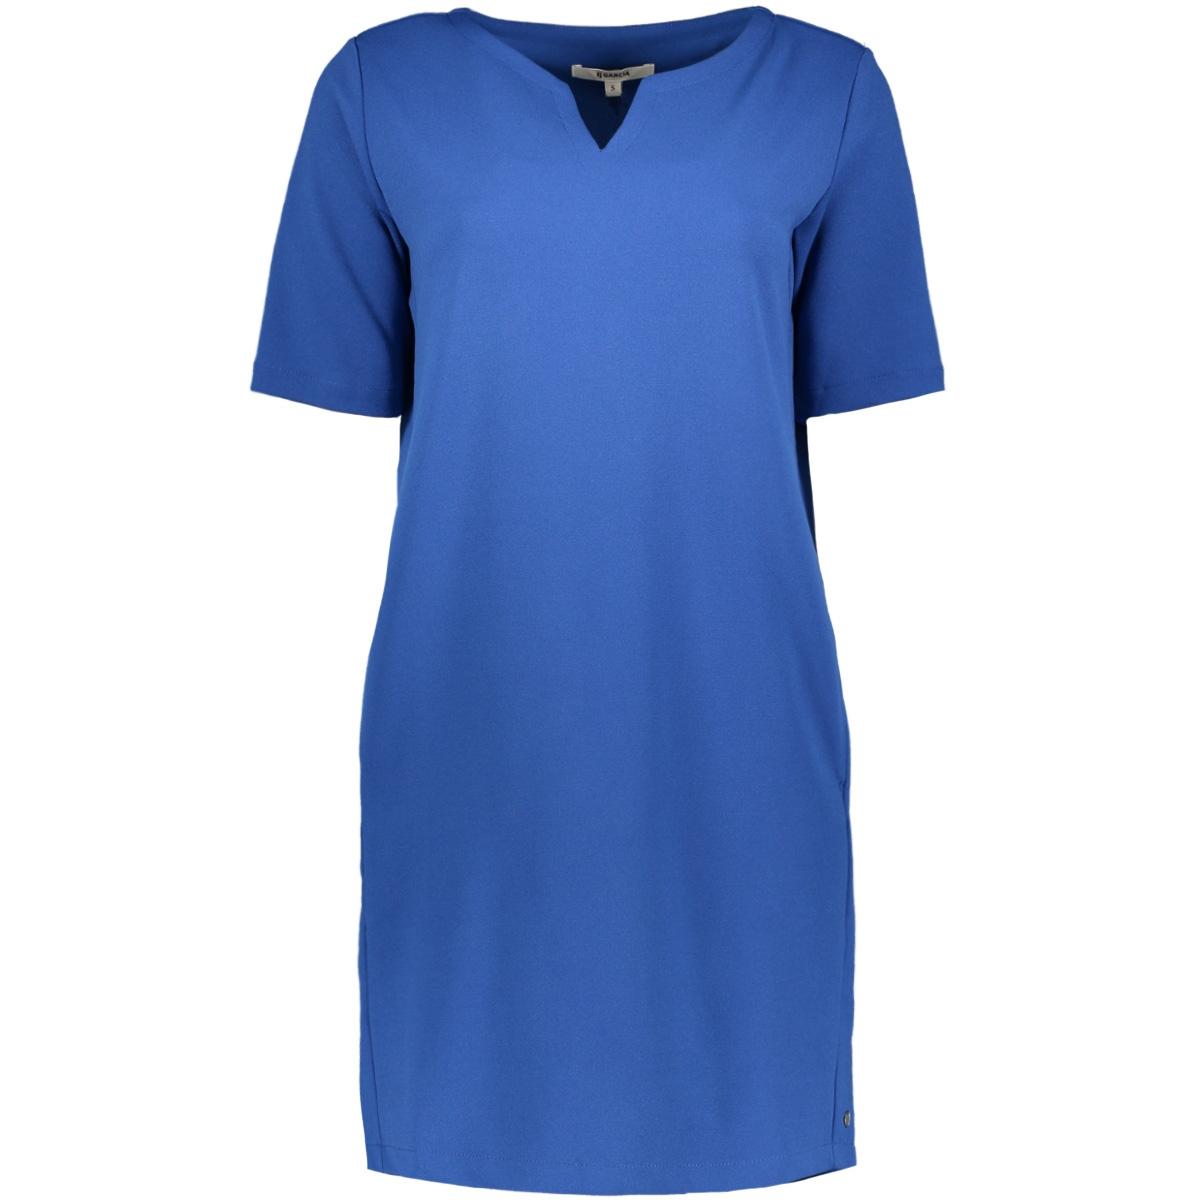 72aea56fec6a41 jurk met zakken gs900280 garcia jurk 2868 classic blue